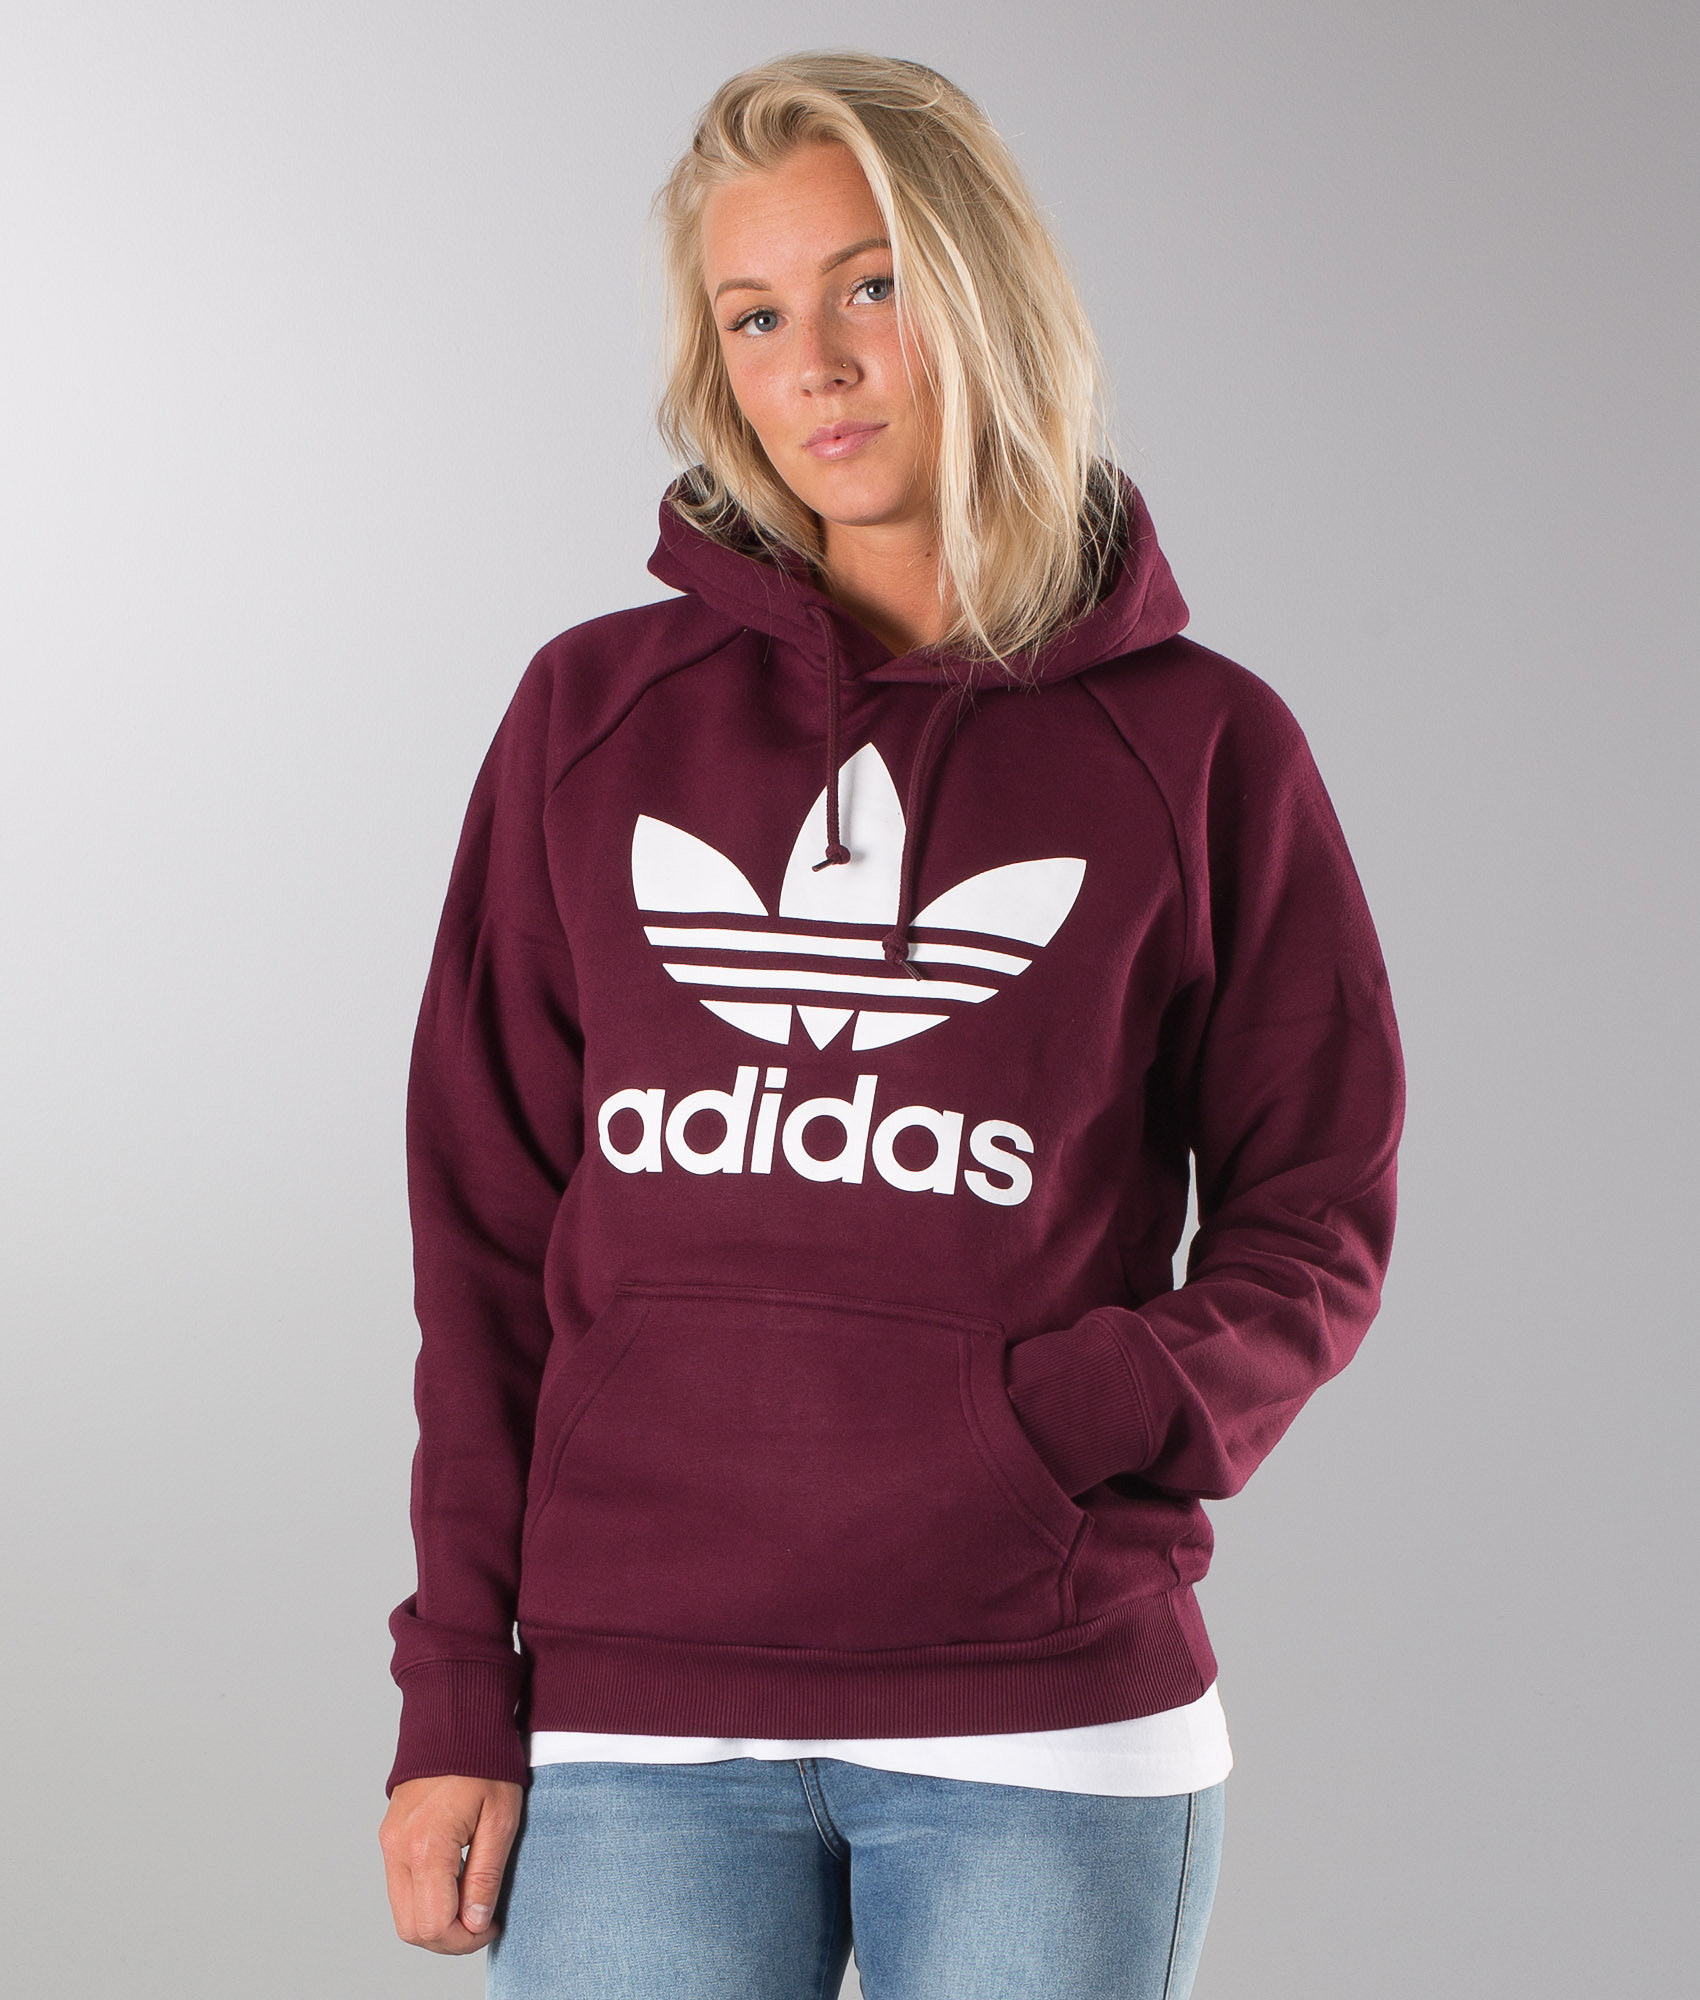 Adidas Originals Trefoil Unisex Huppari Maroon - Ridestore.fi f4fbcd2641